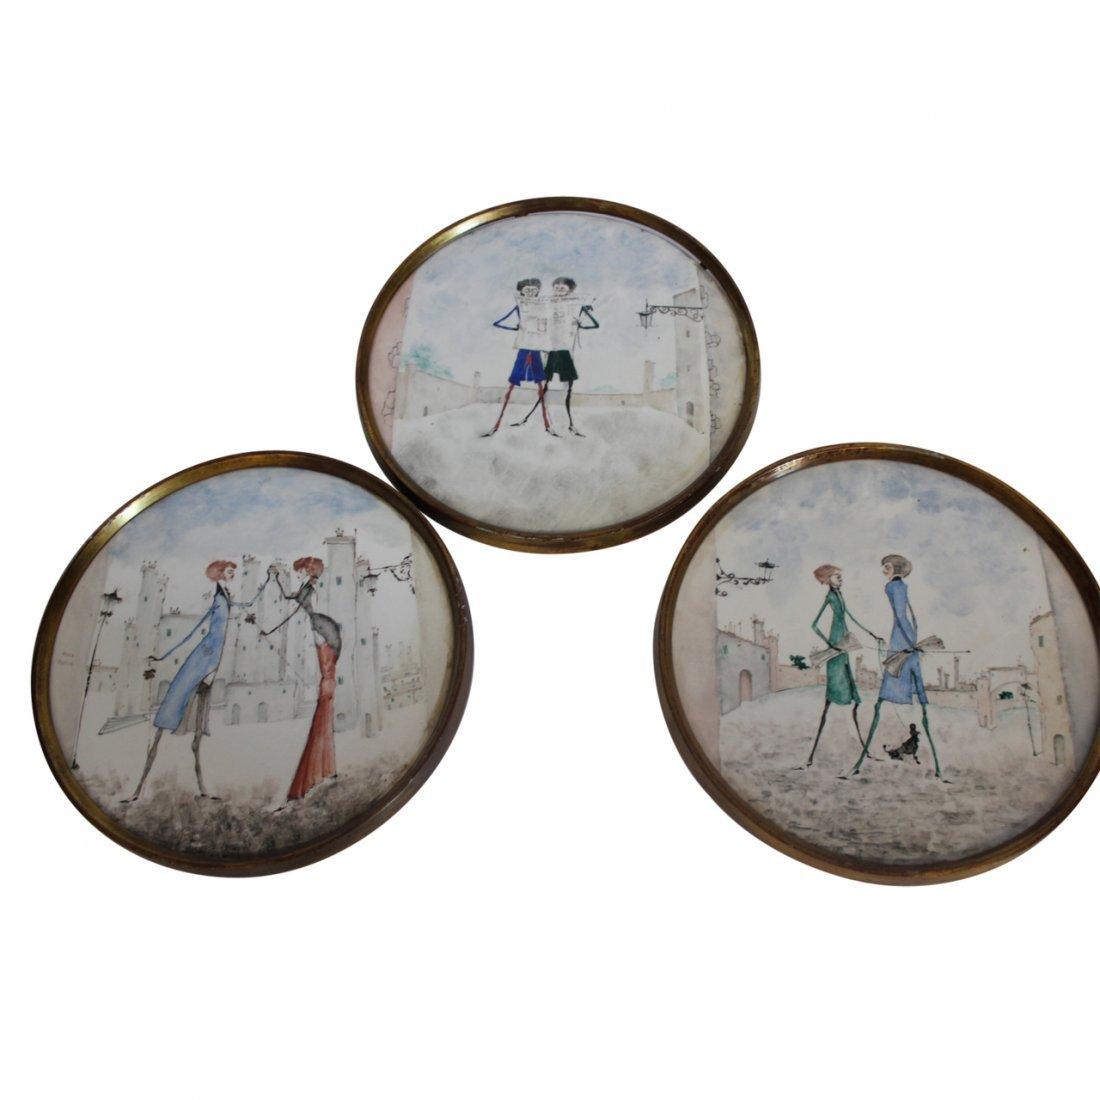 A. Miniati Porcelain Plaques (3)